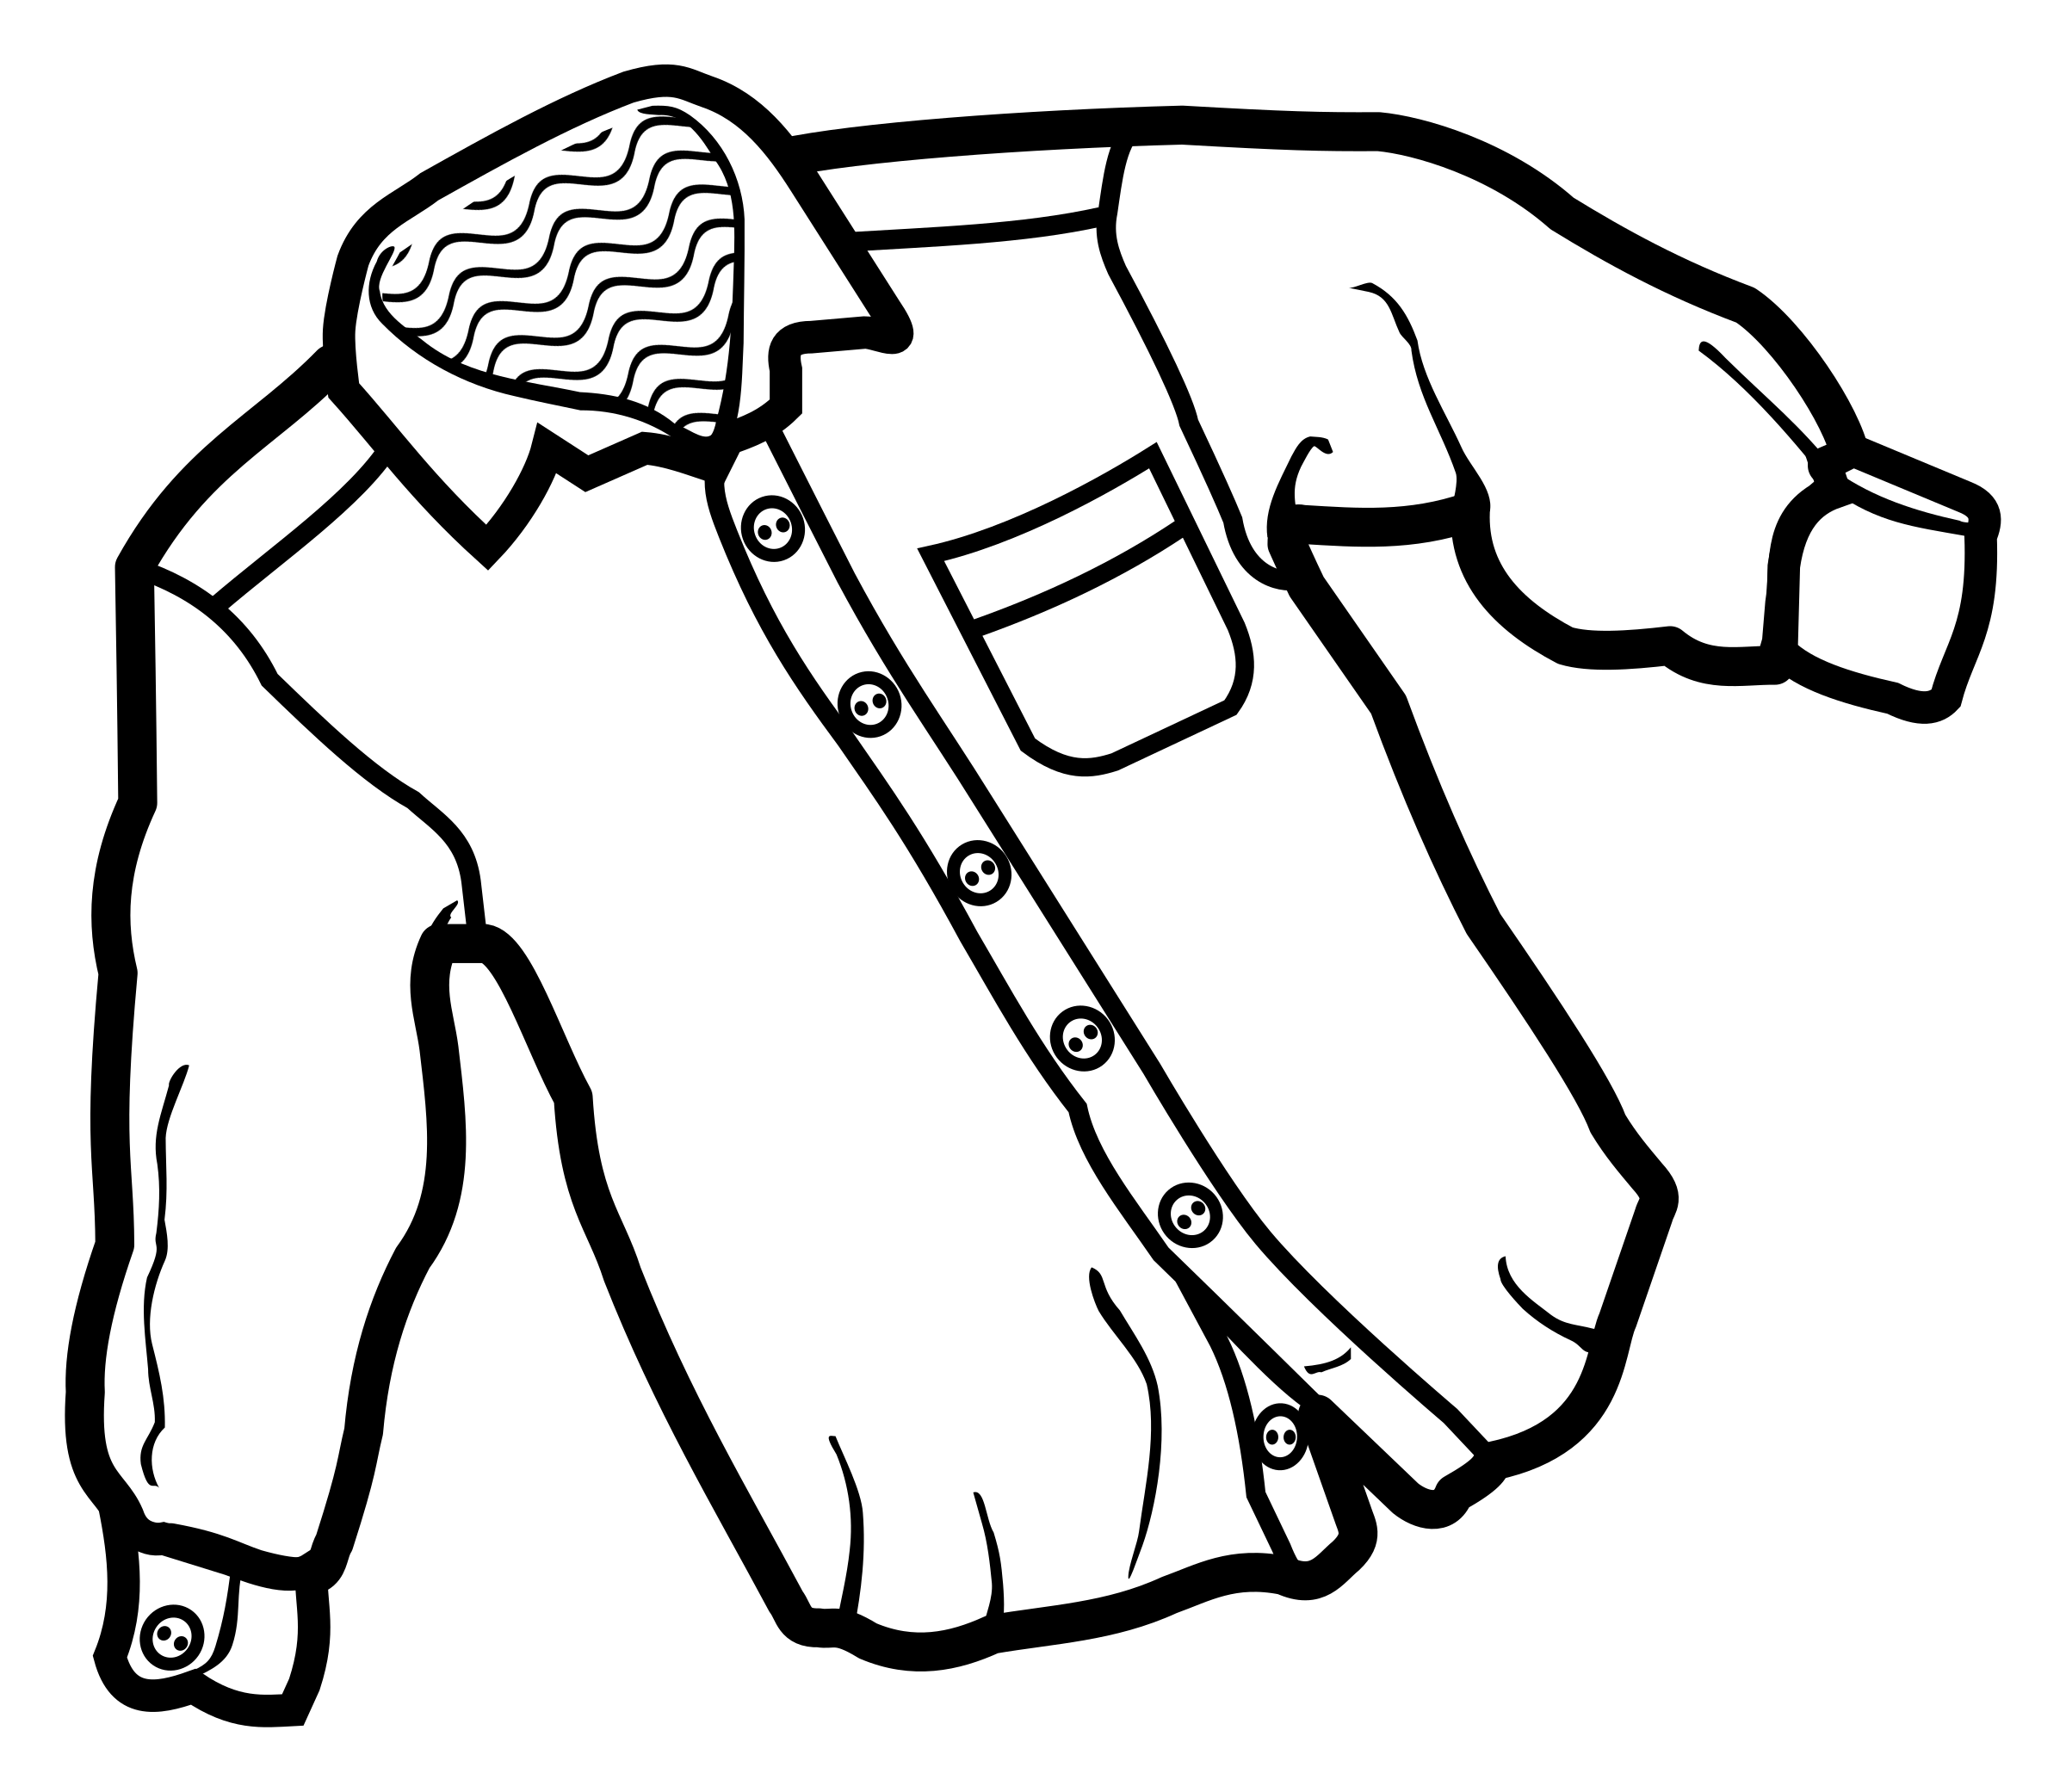 Clipart shirt school shirt. Lineart big image png